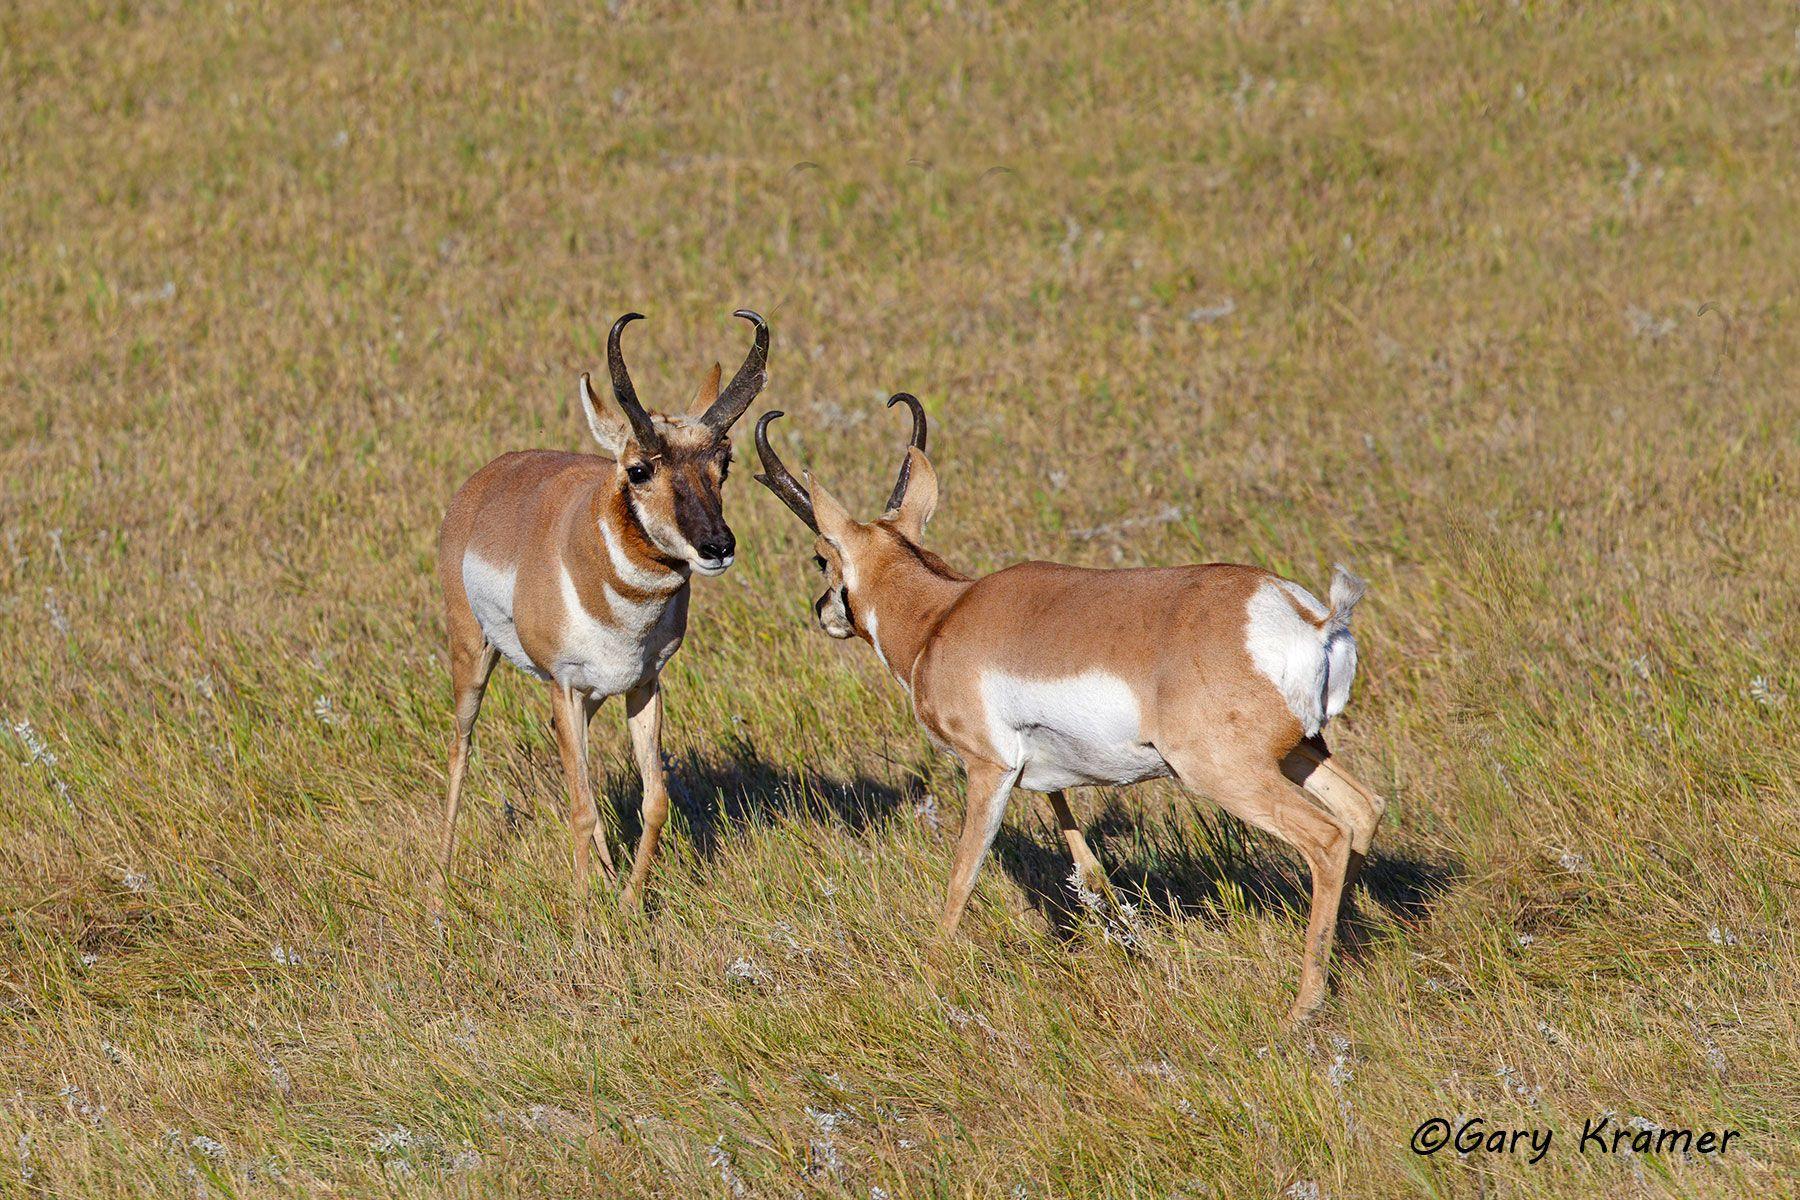 Pronghorn (Antilocapra americana) - NMP#663d